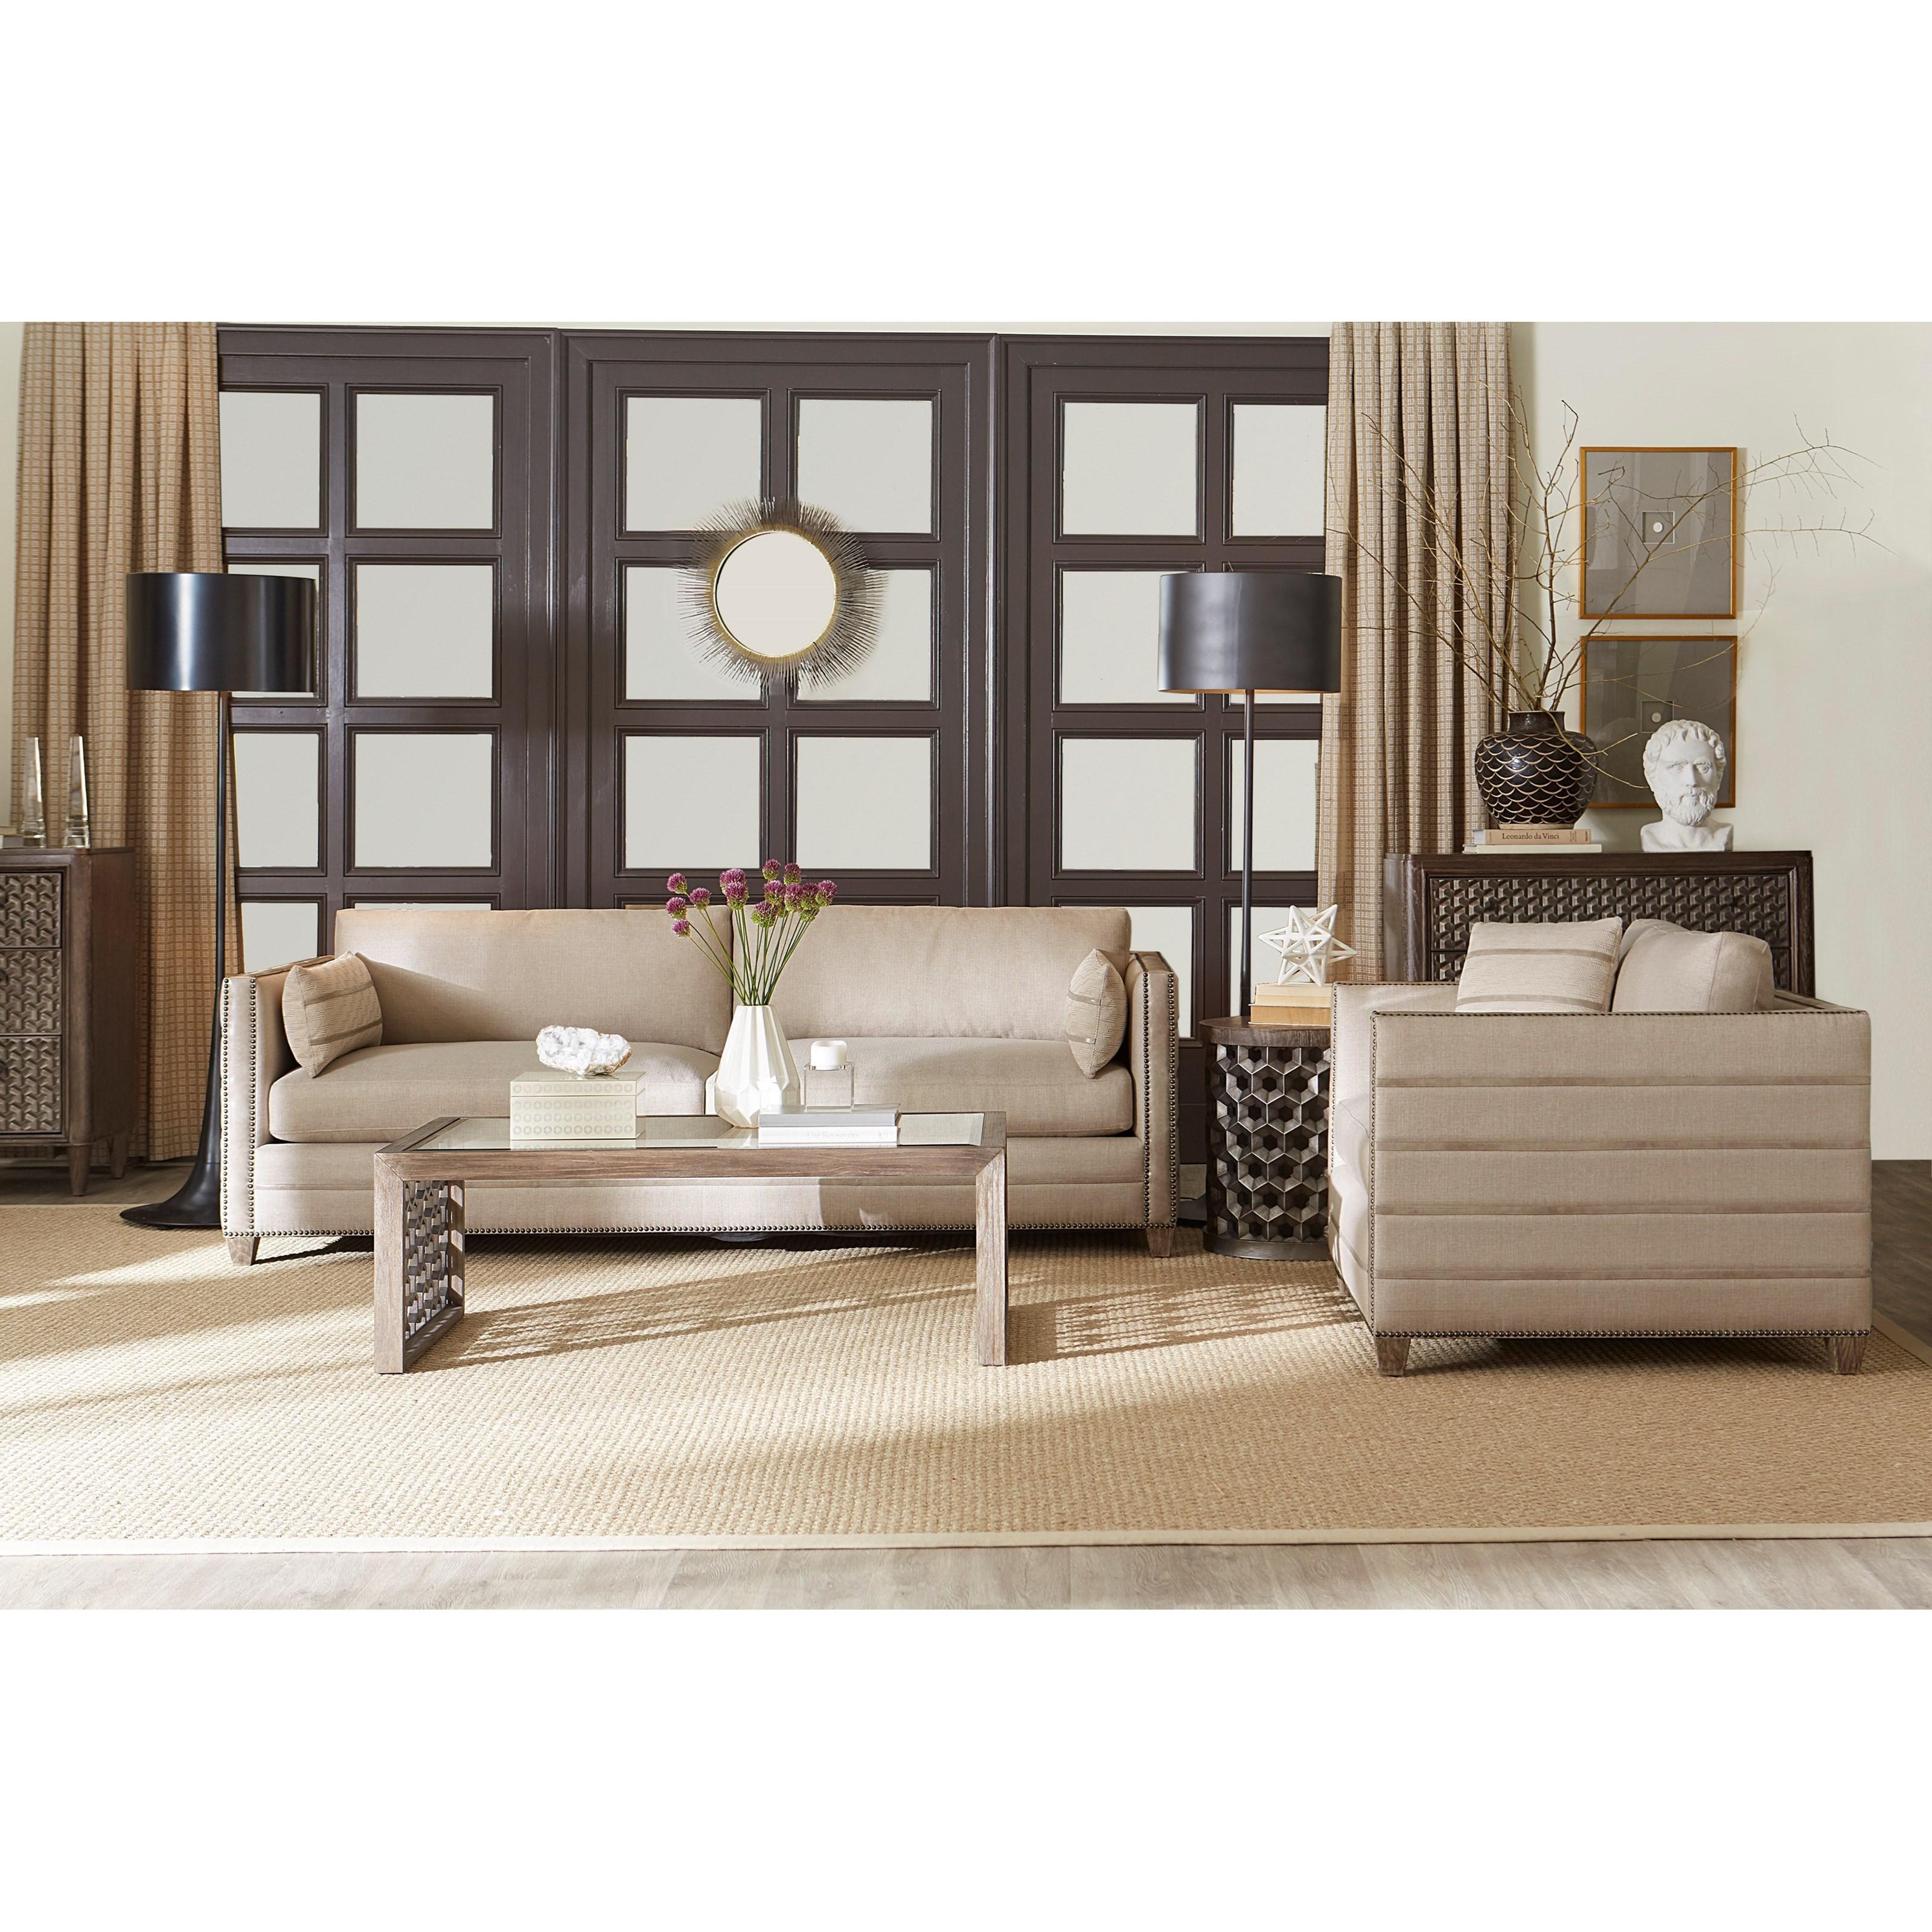 A.R.T. Furniture Inc Allister GreigeSofa; A.R.T. Furniture Inc Allister  GreigeSofa